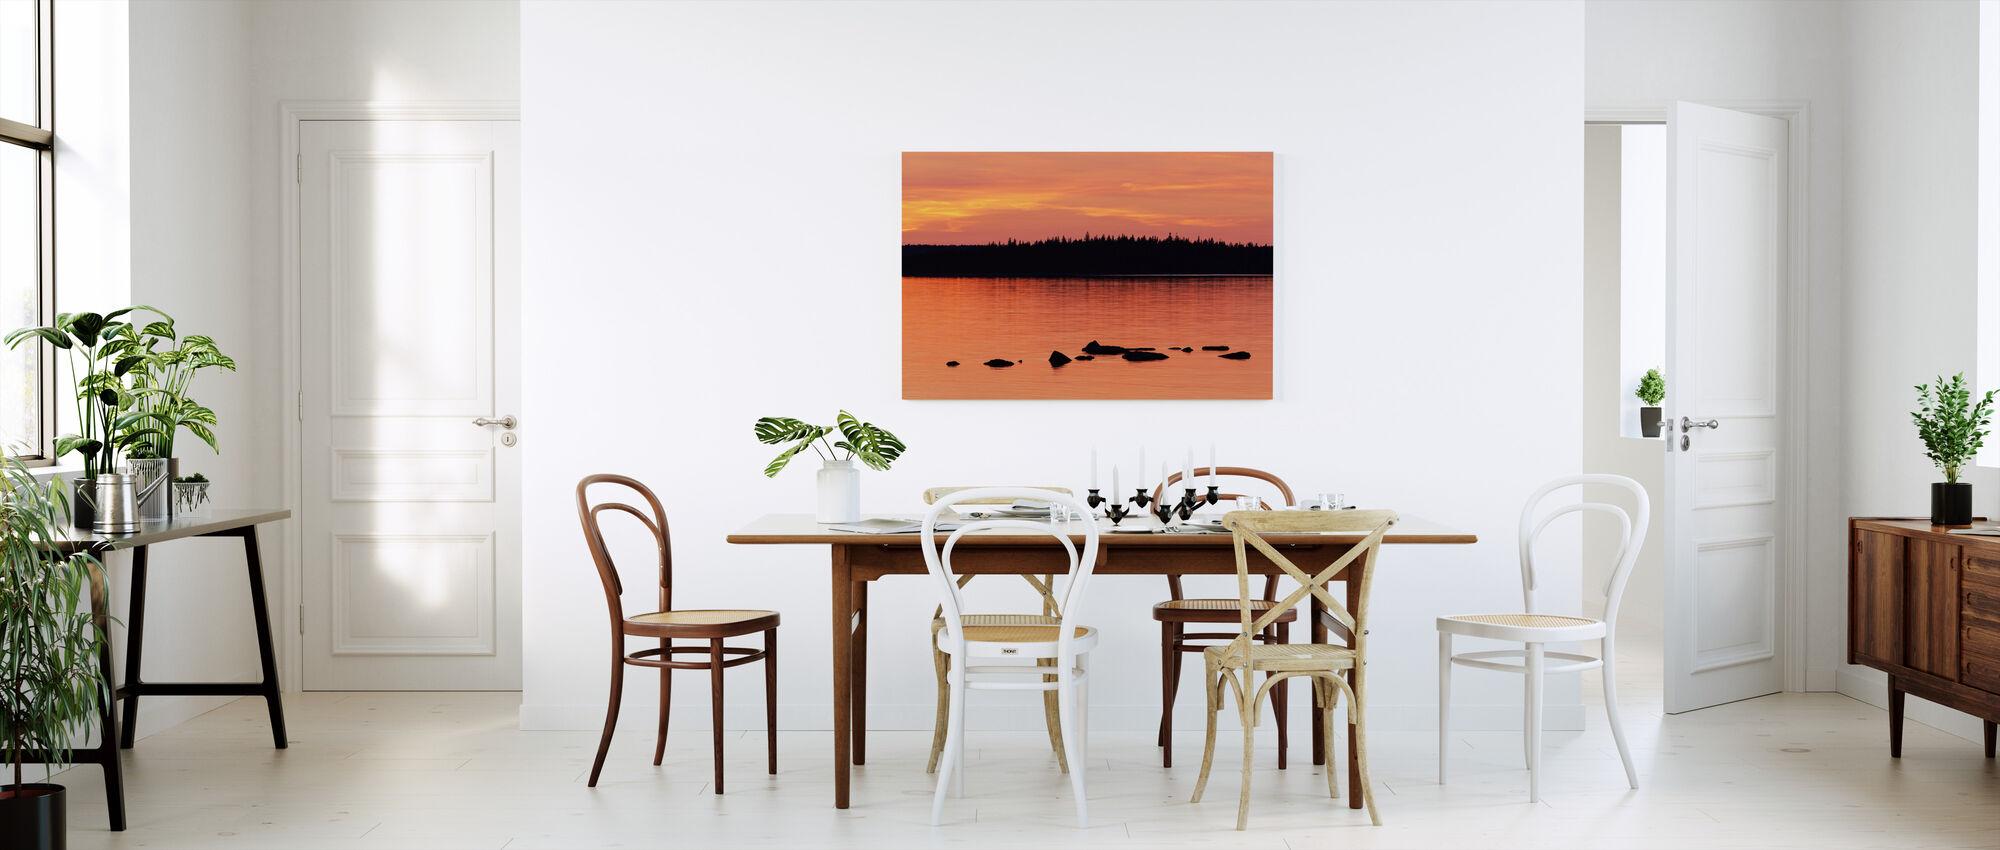 Sundown, Gotland - Canvas print - Kitchen